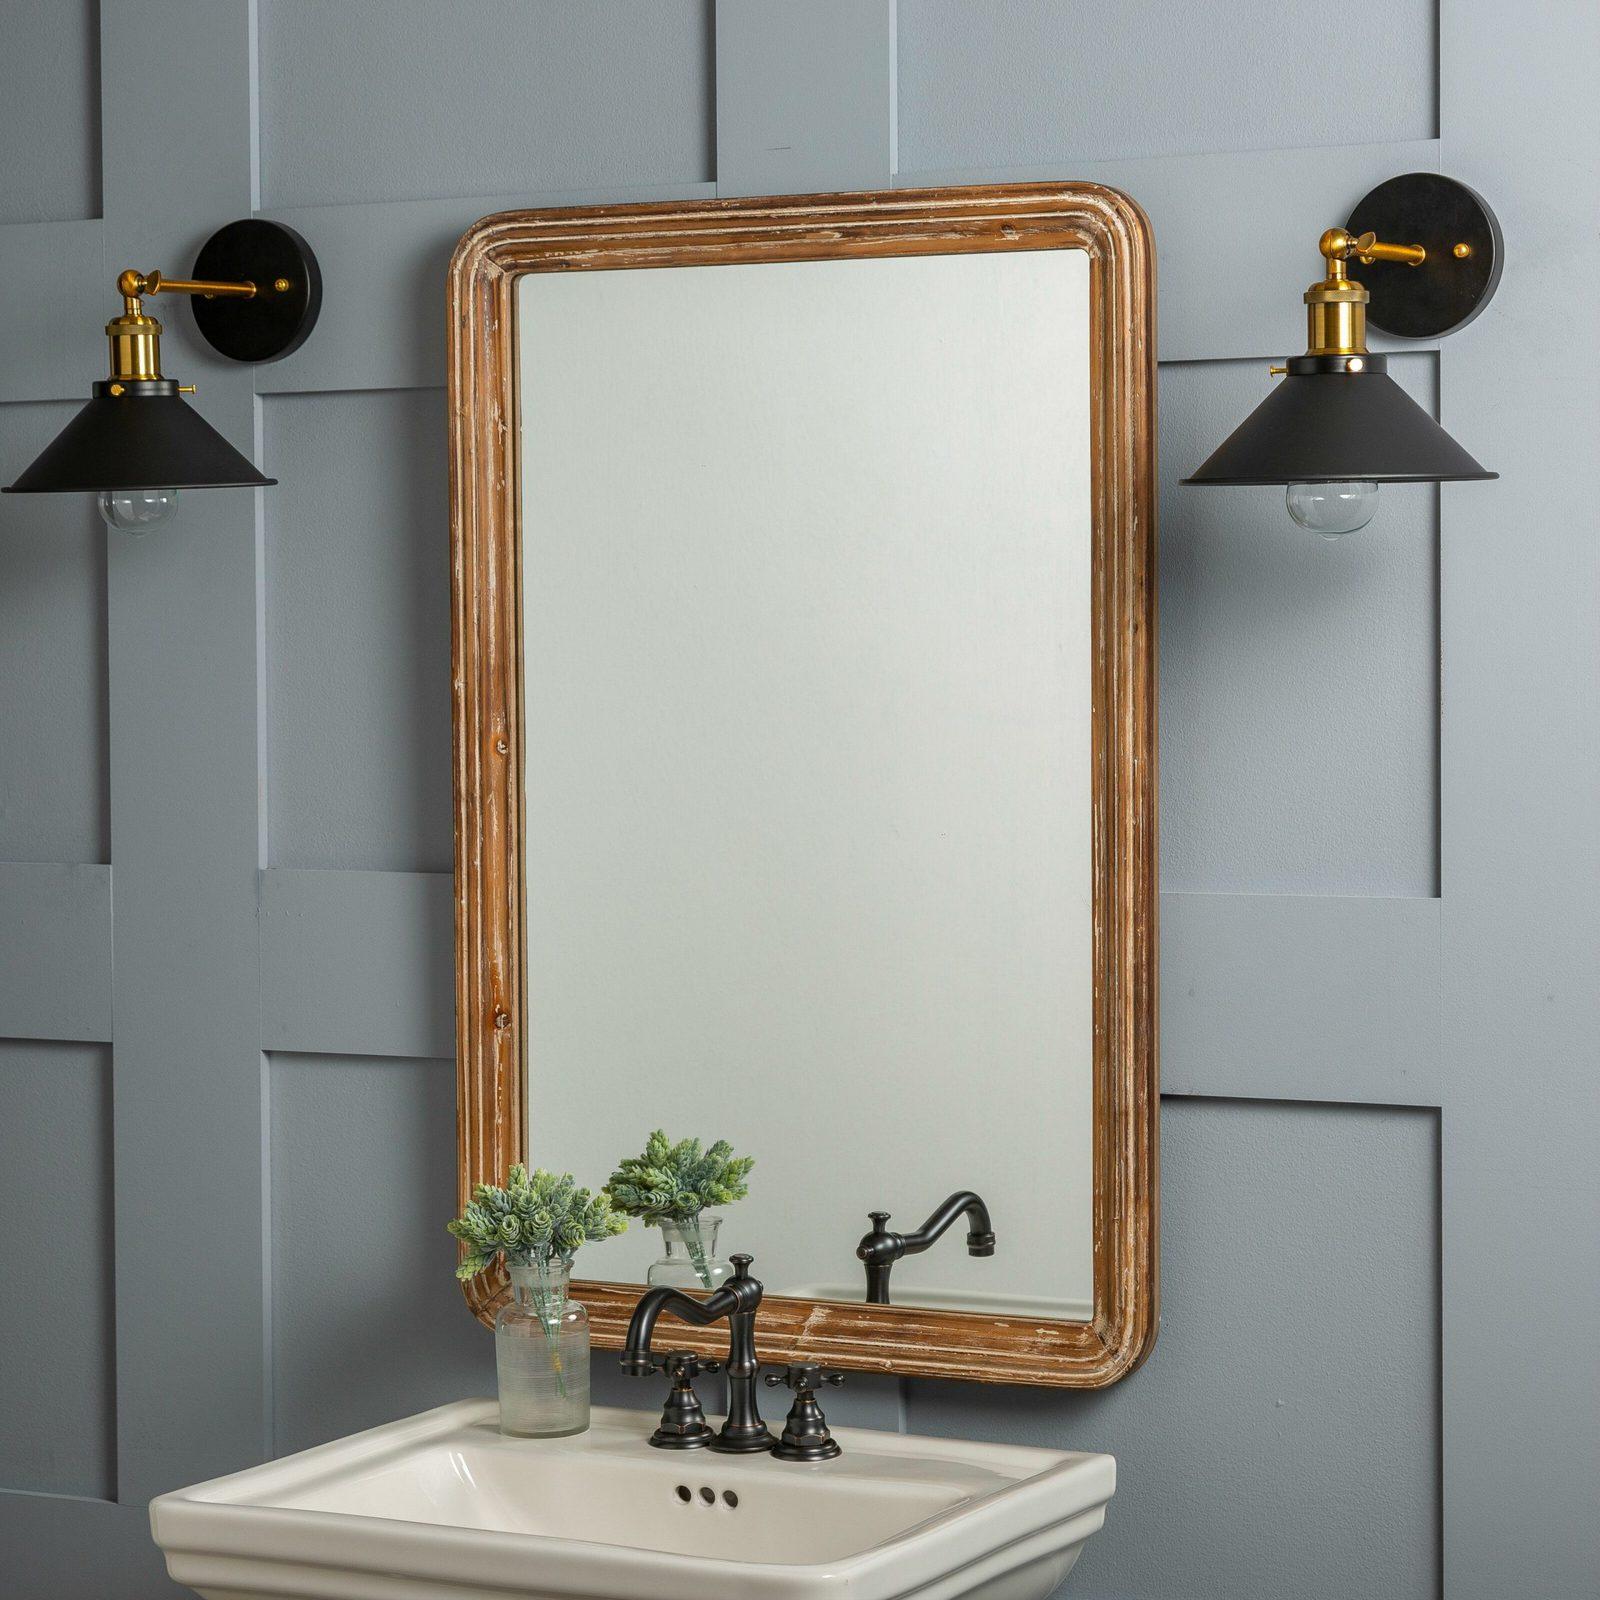 26 beautiful bathroom mirror ideas